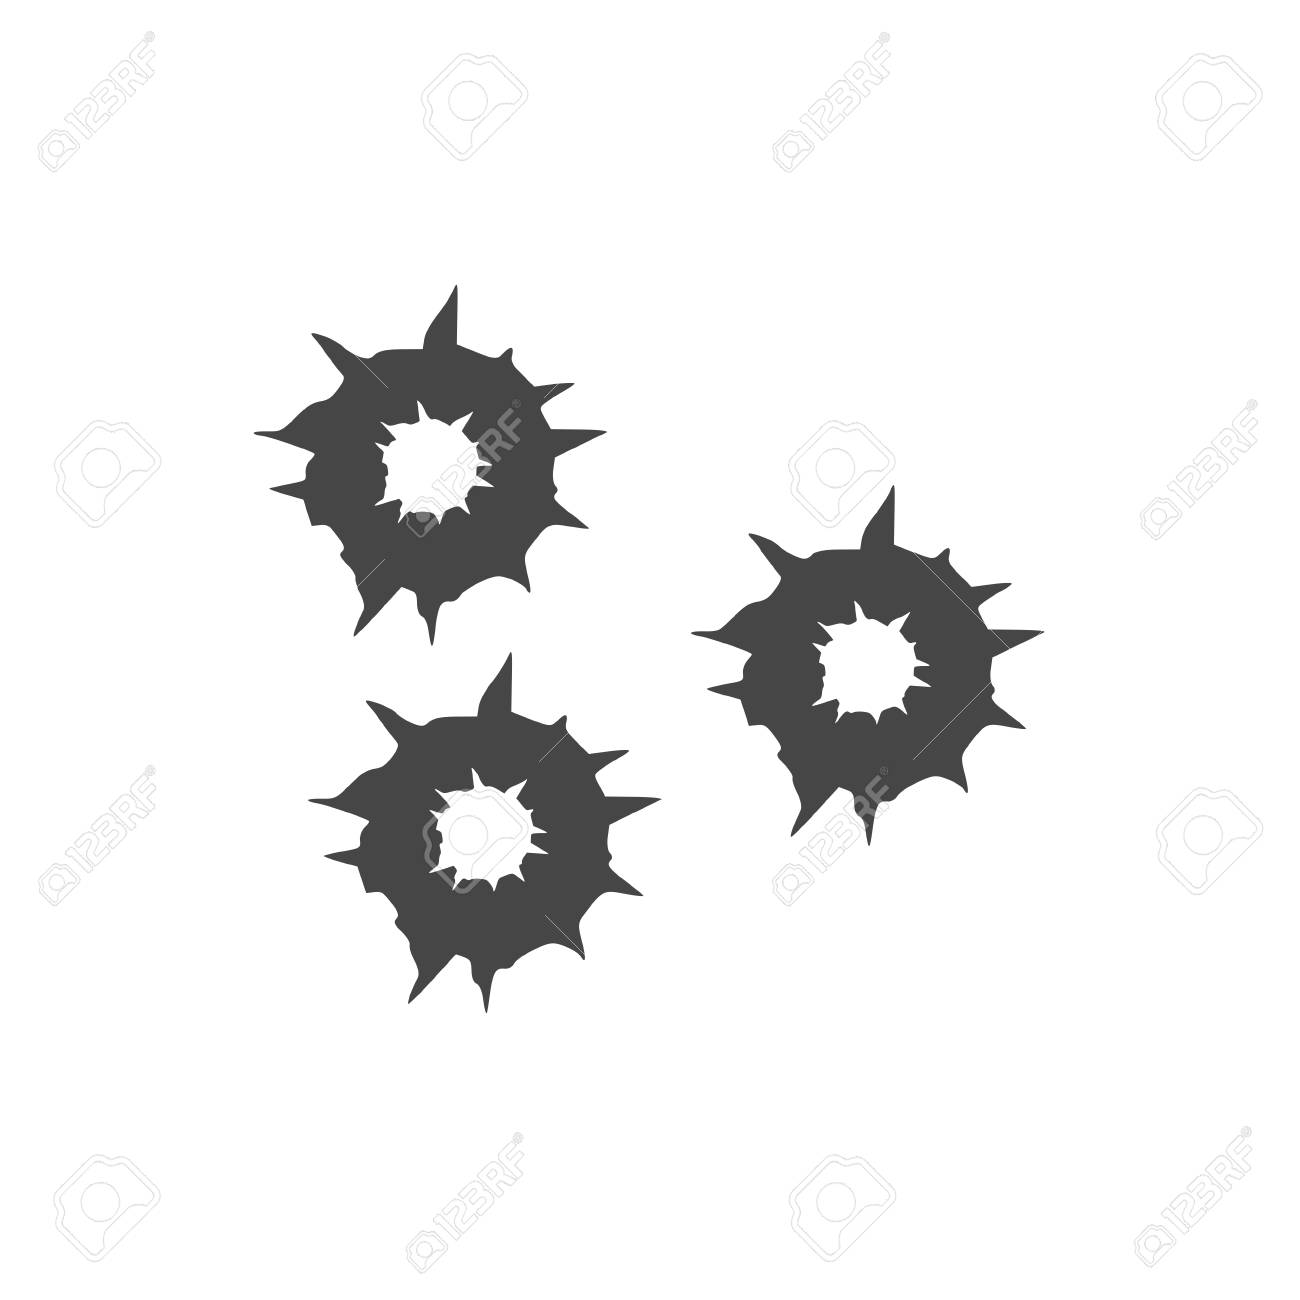 bullet holes vector royalty free cliparts vectors and stock rh 123rf com bullet hole vector art bullet hole vector art free